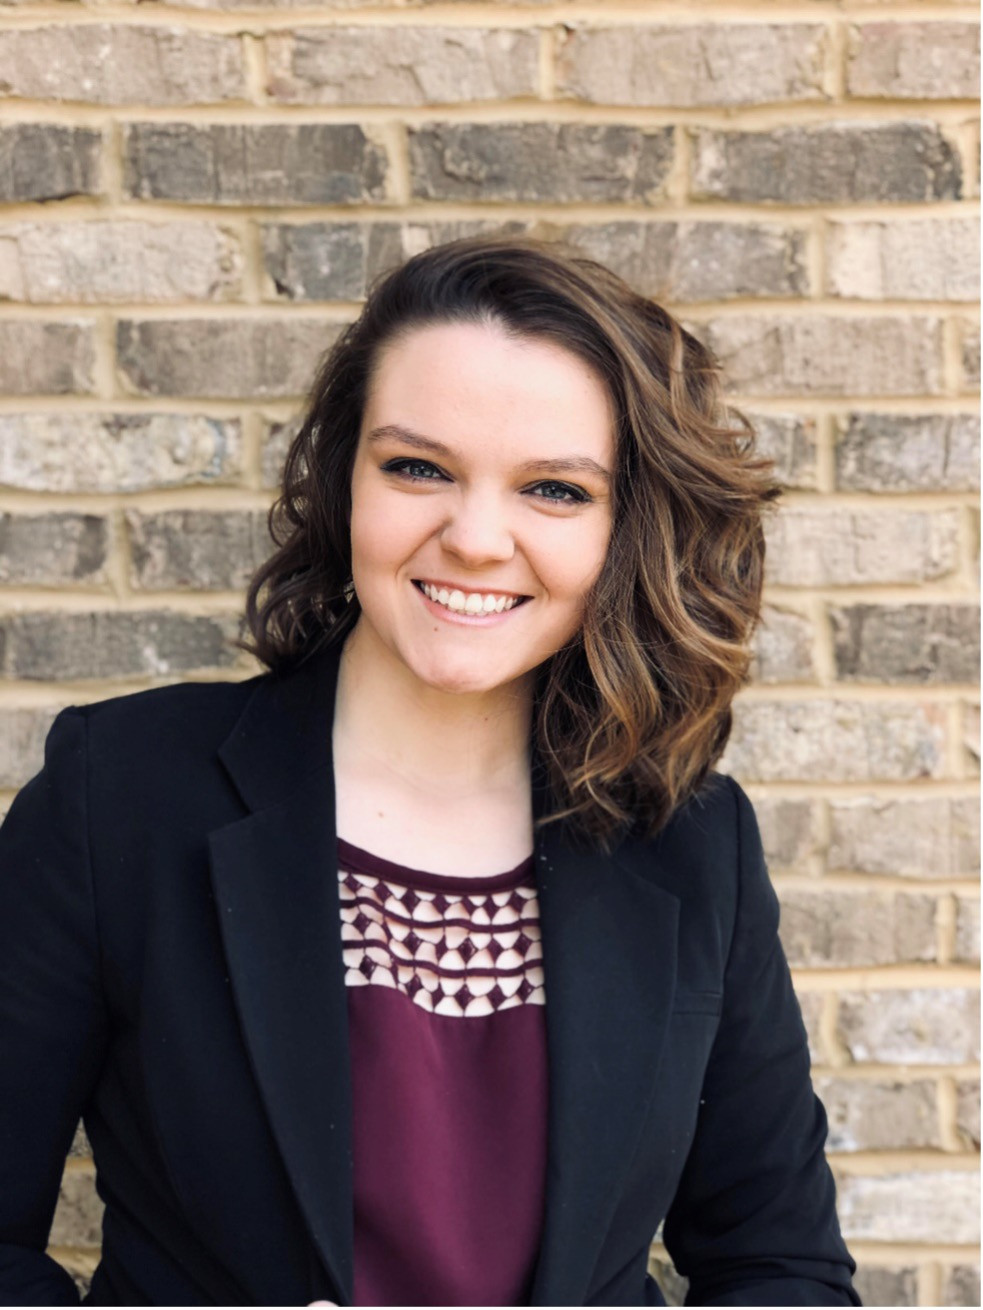 Ms. Kaitlyn Hopkins, Choir Director for Morristown West.